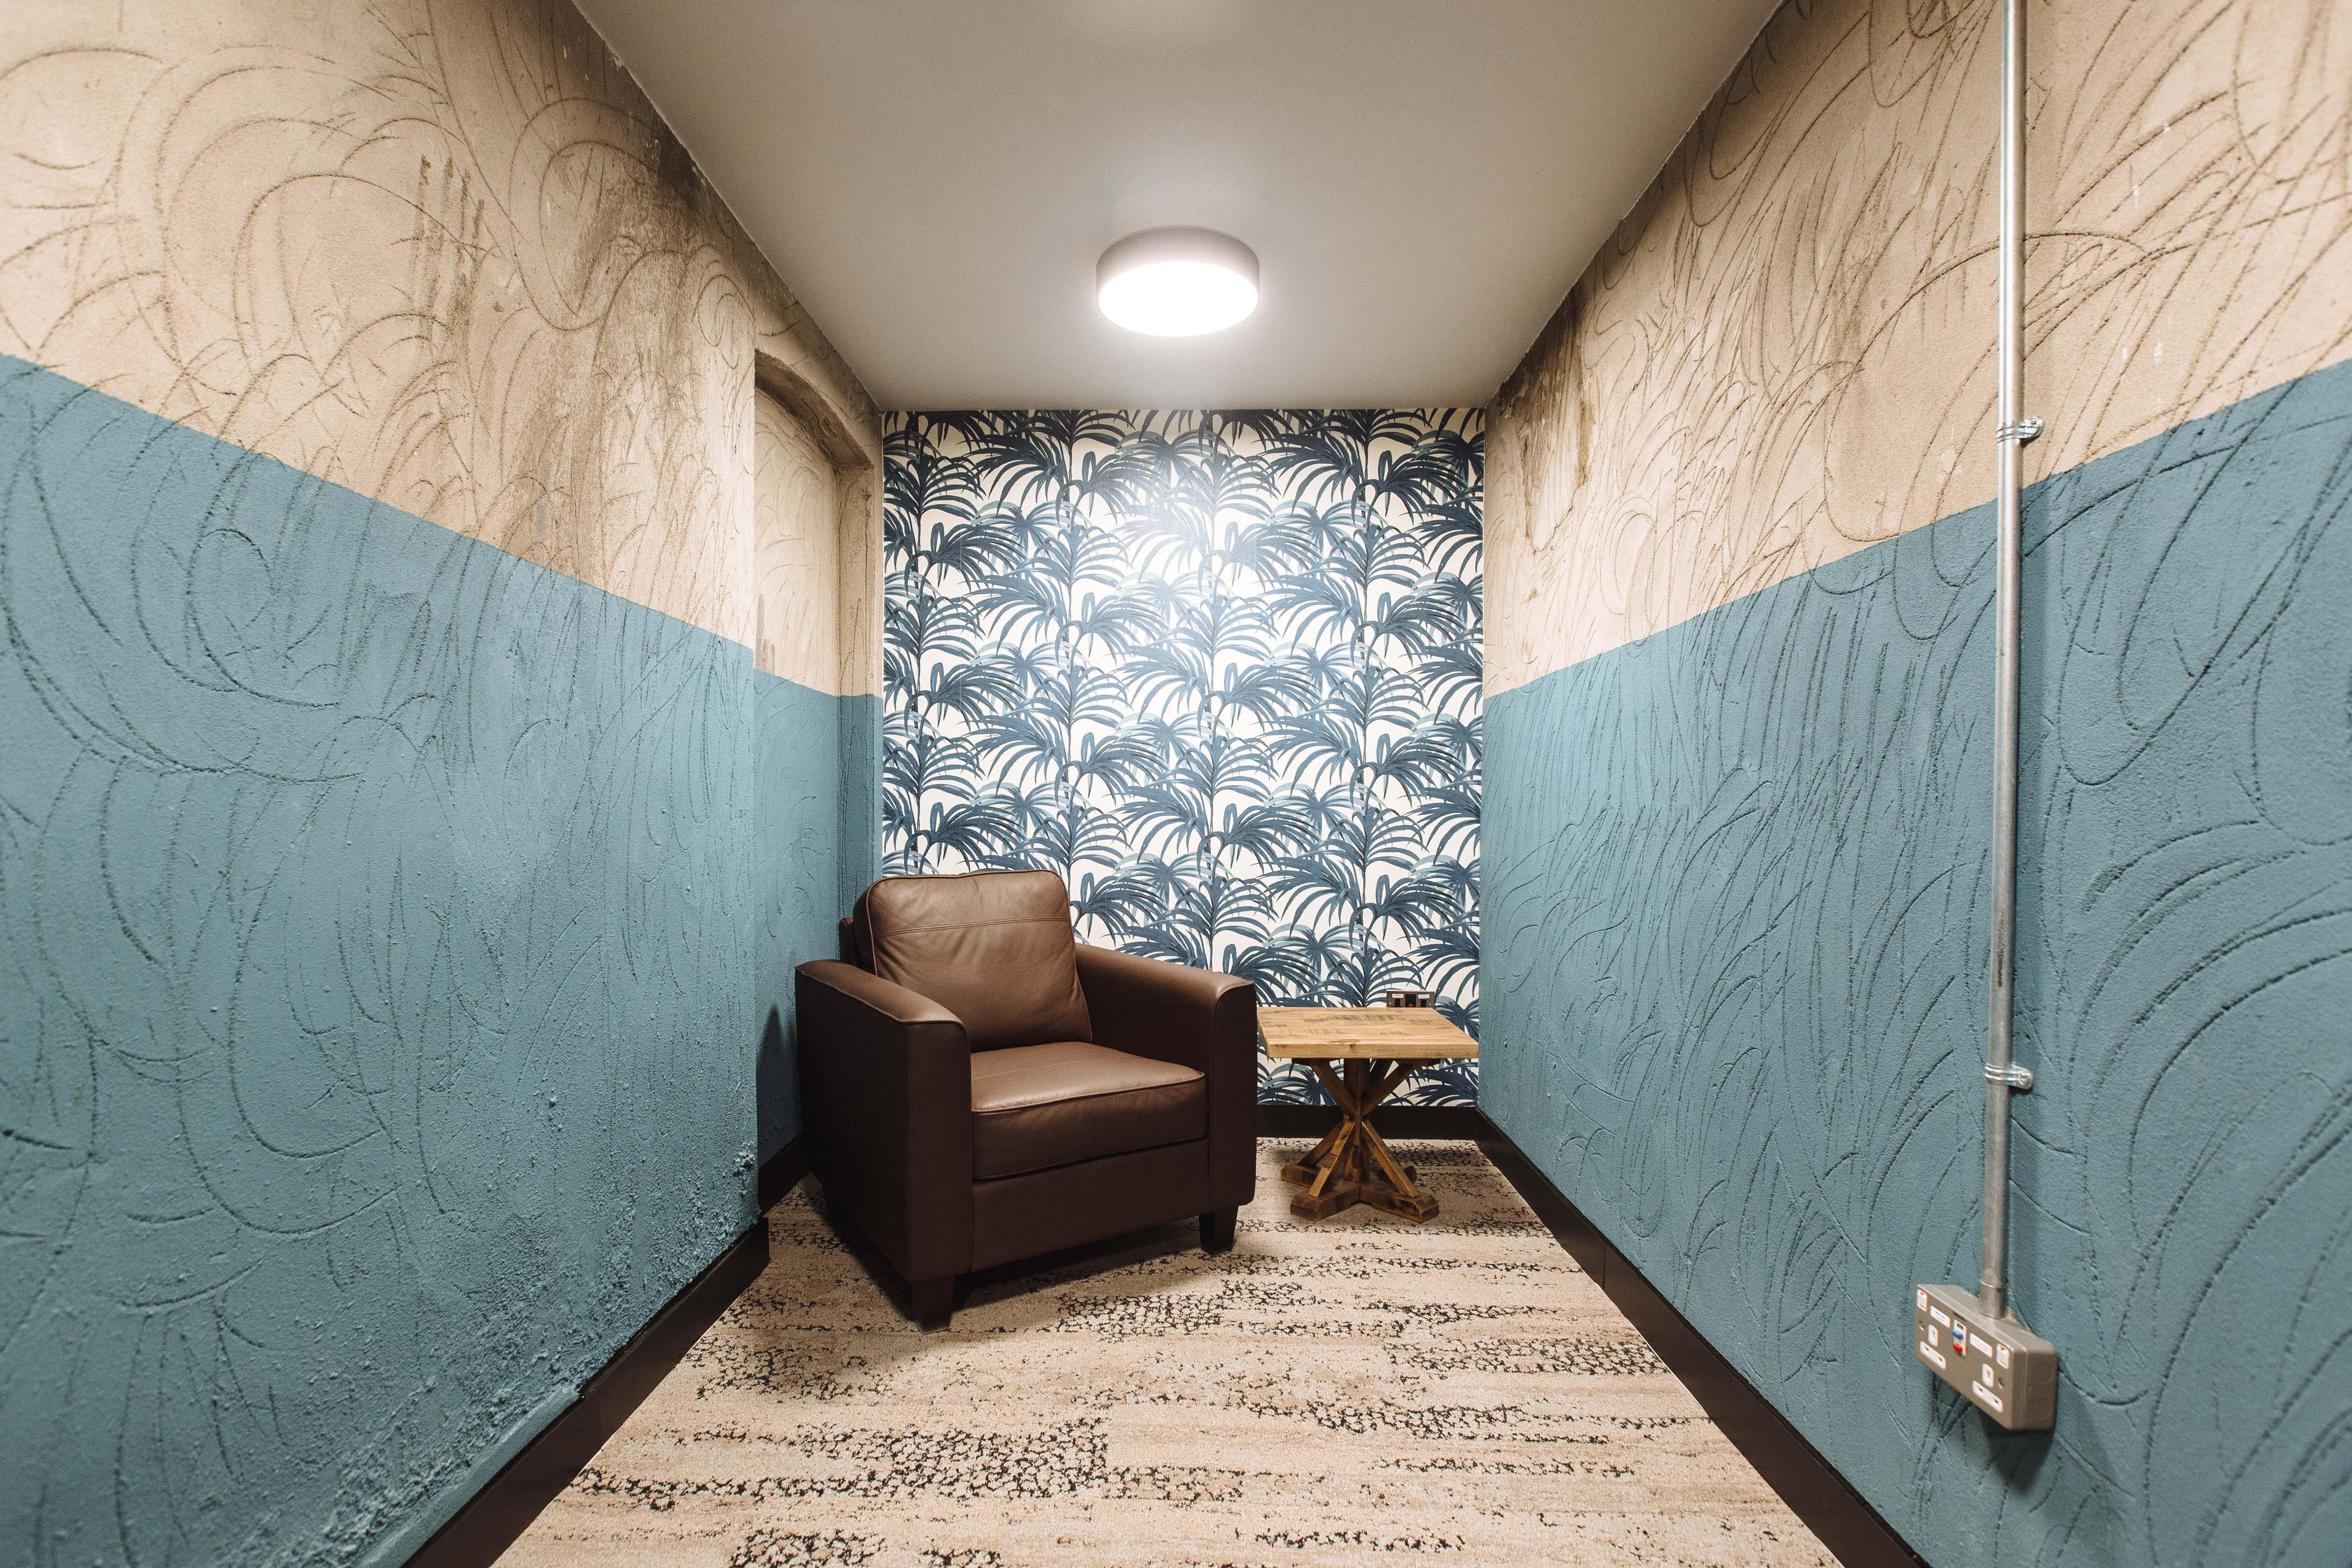 Phone room office space photos custom spaces - Phone Room Office Space Photos Custom Spaces 53